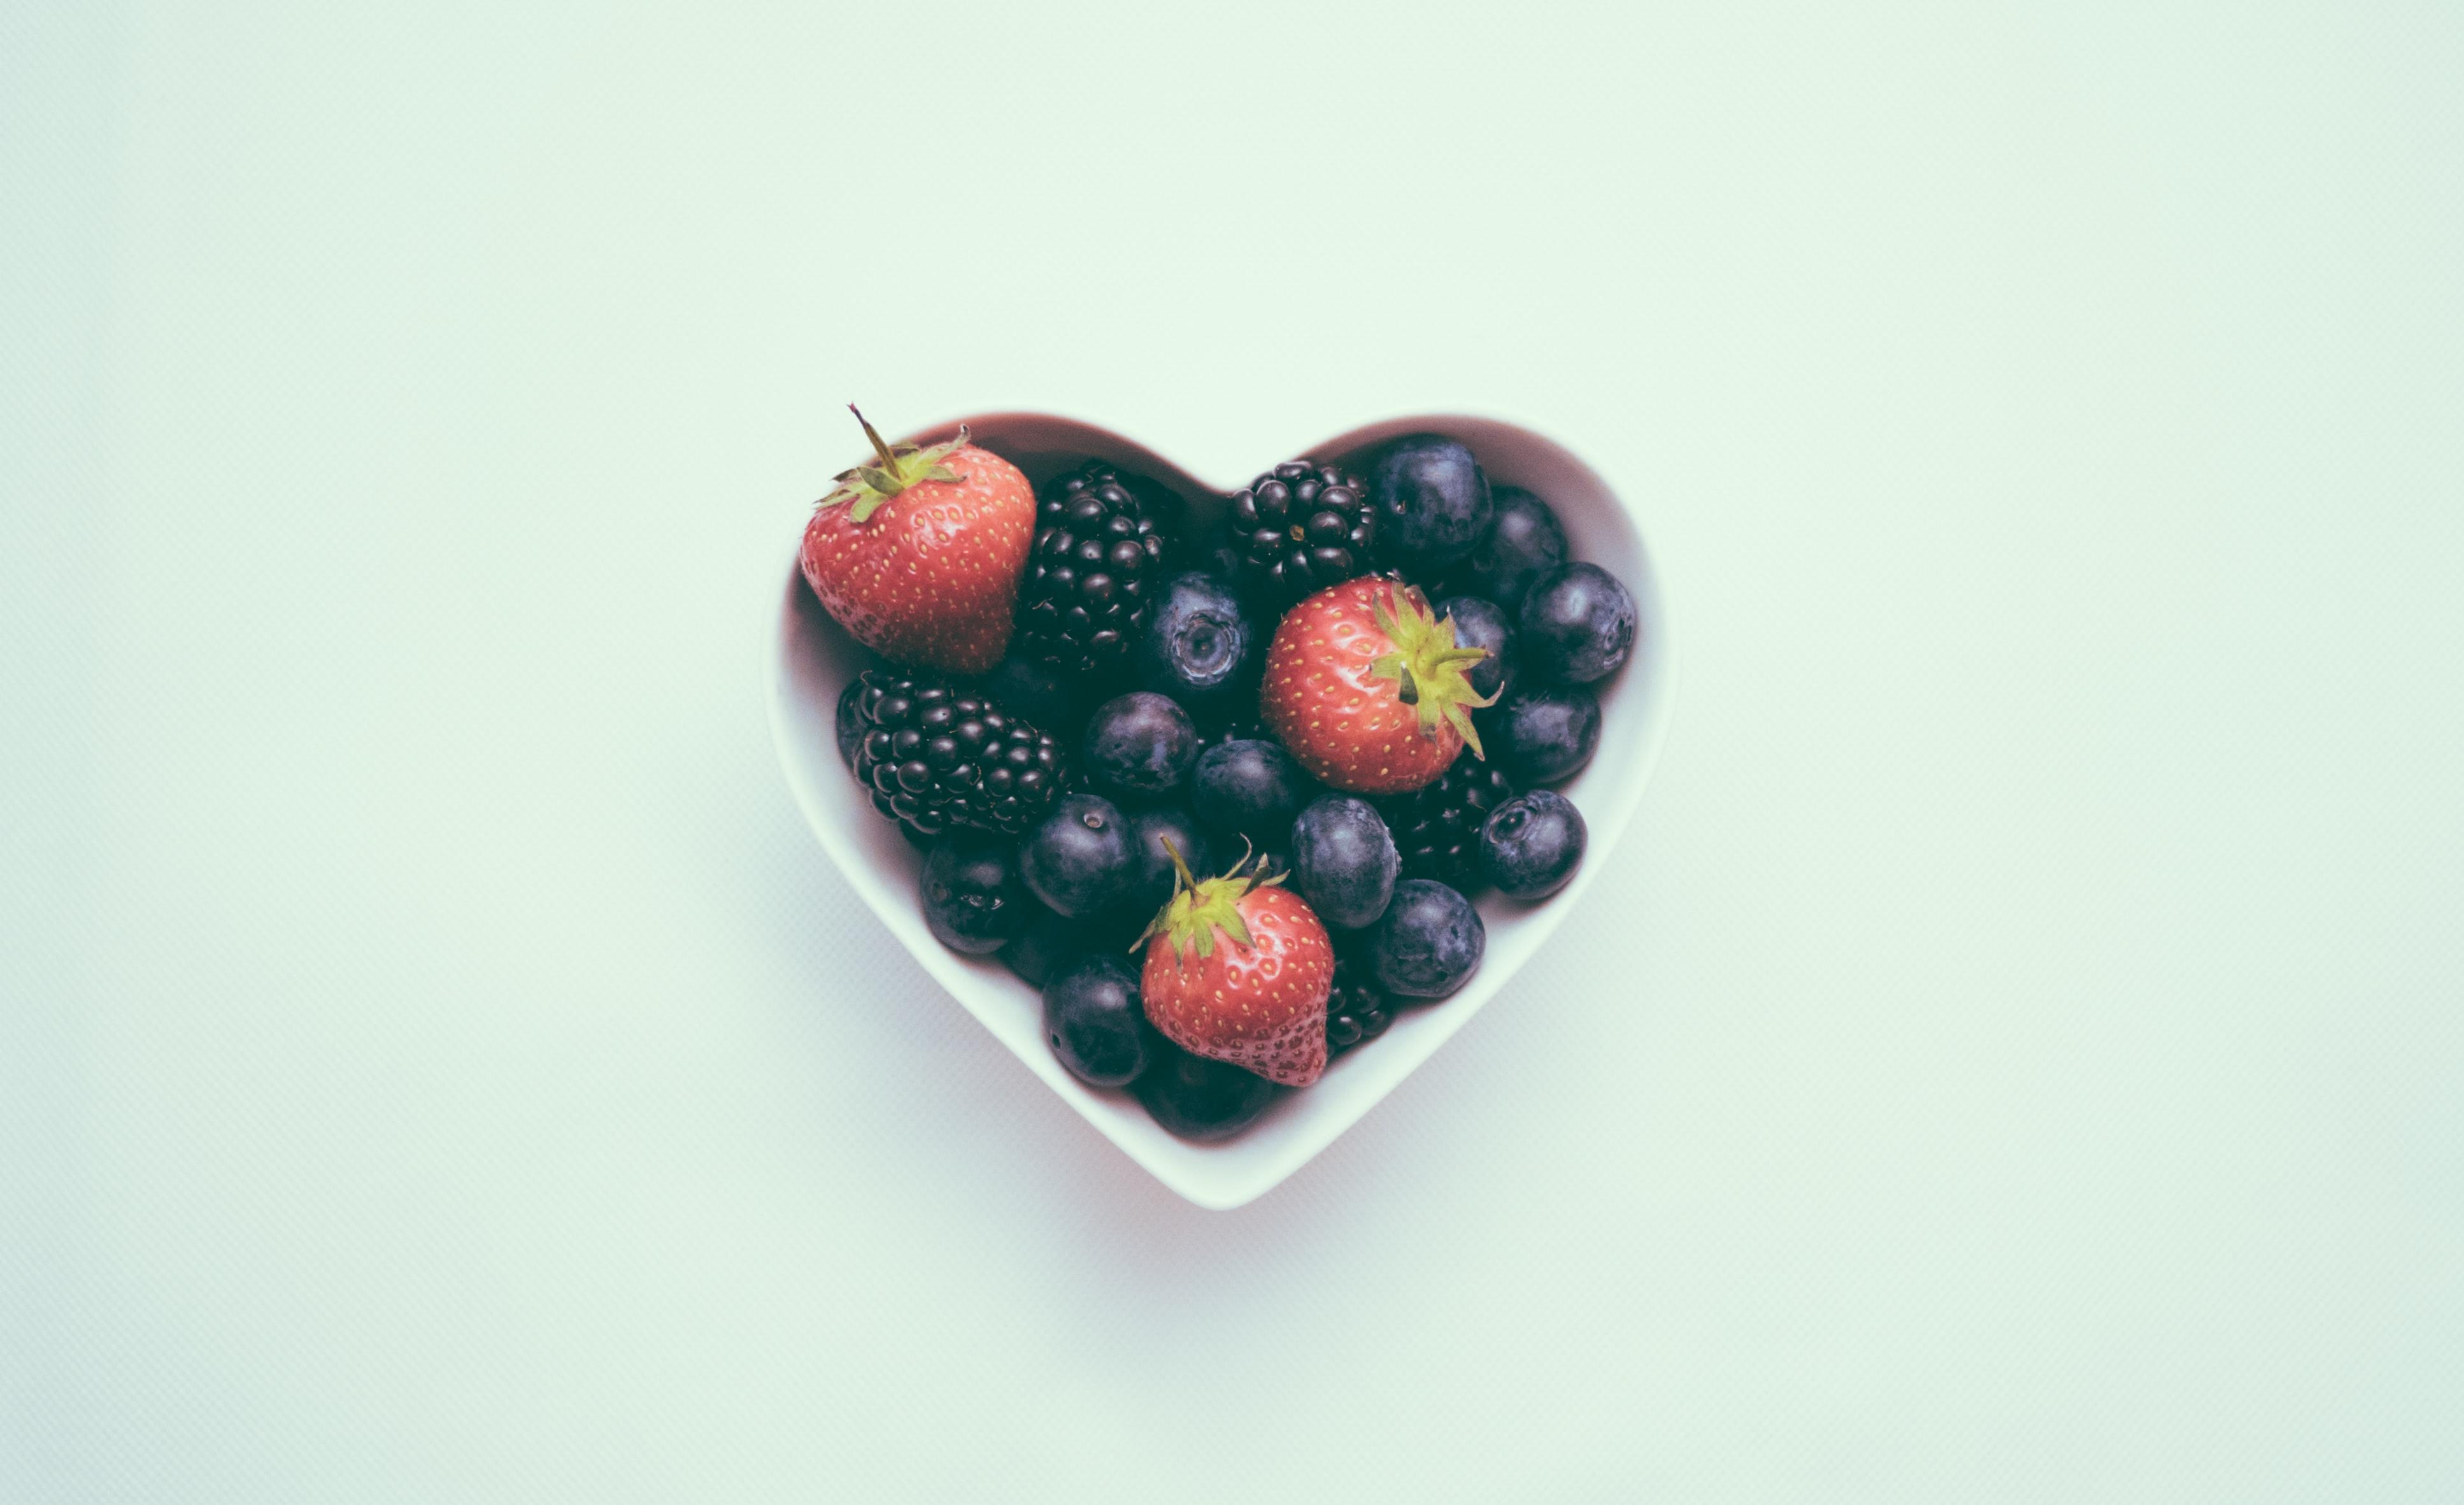 Heart shaped bowl full of berries